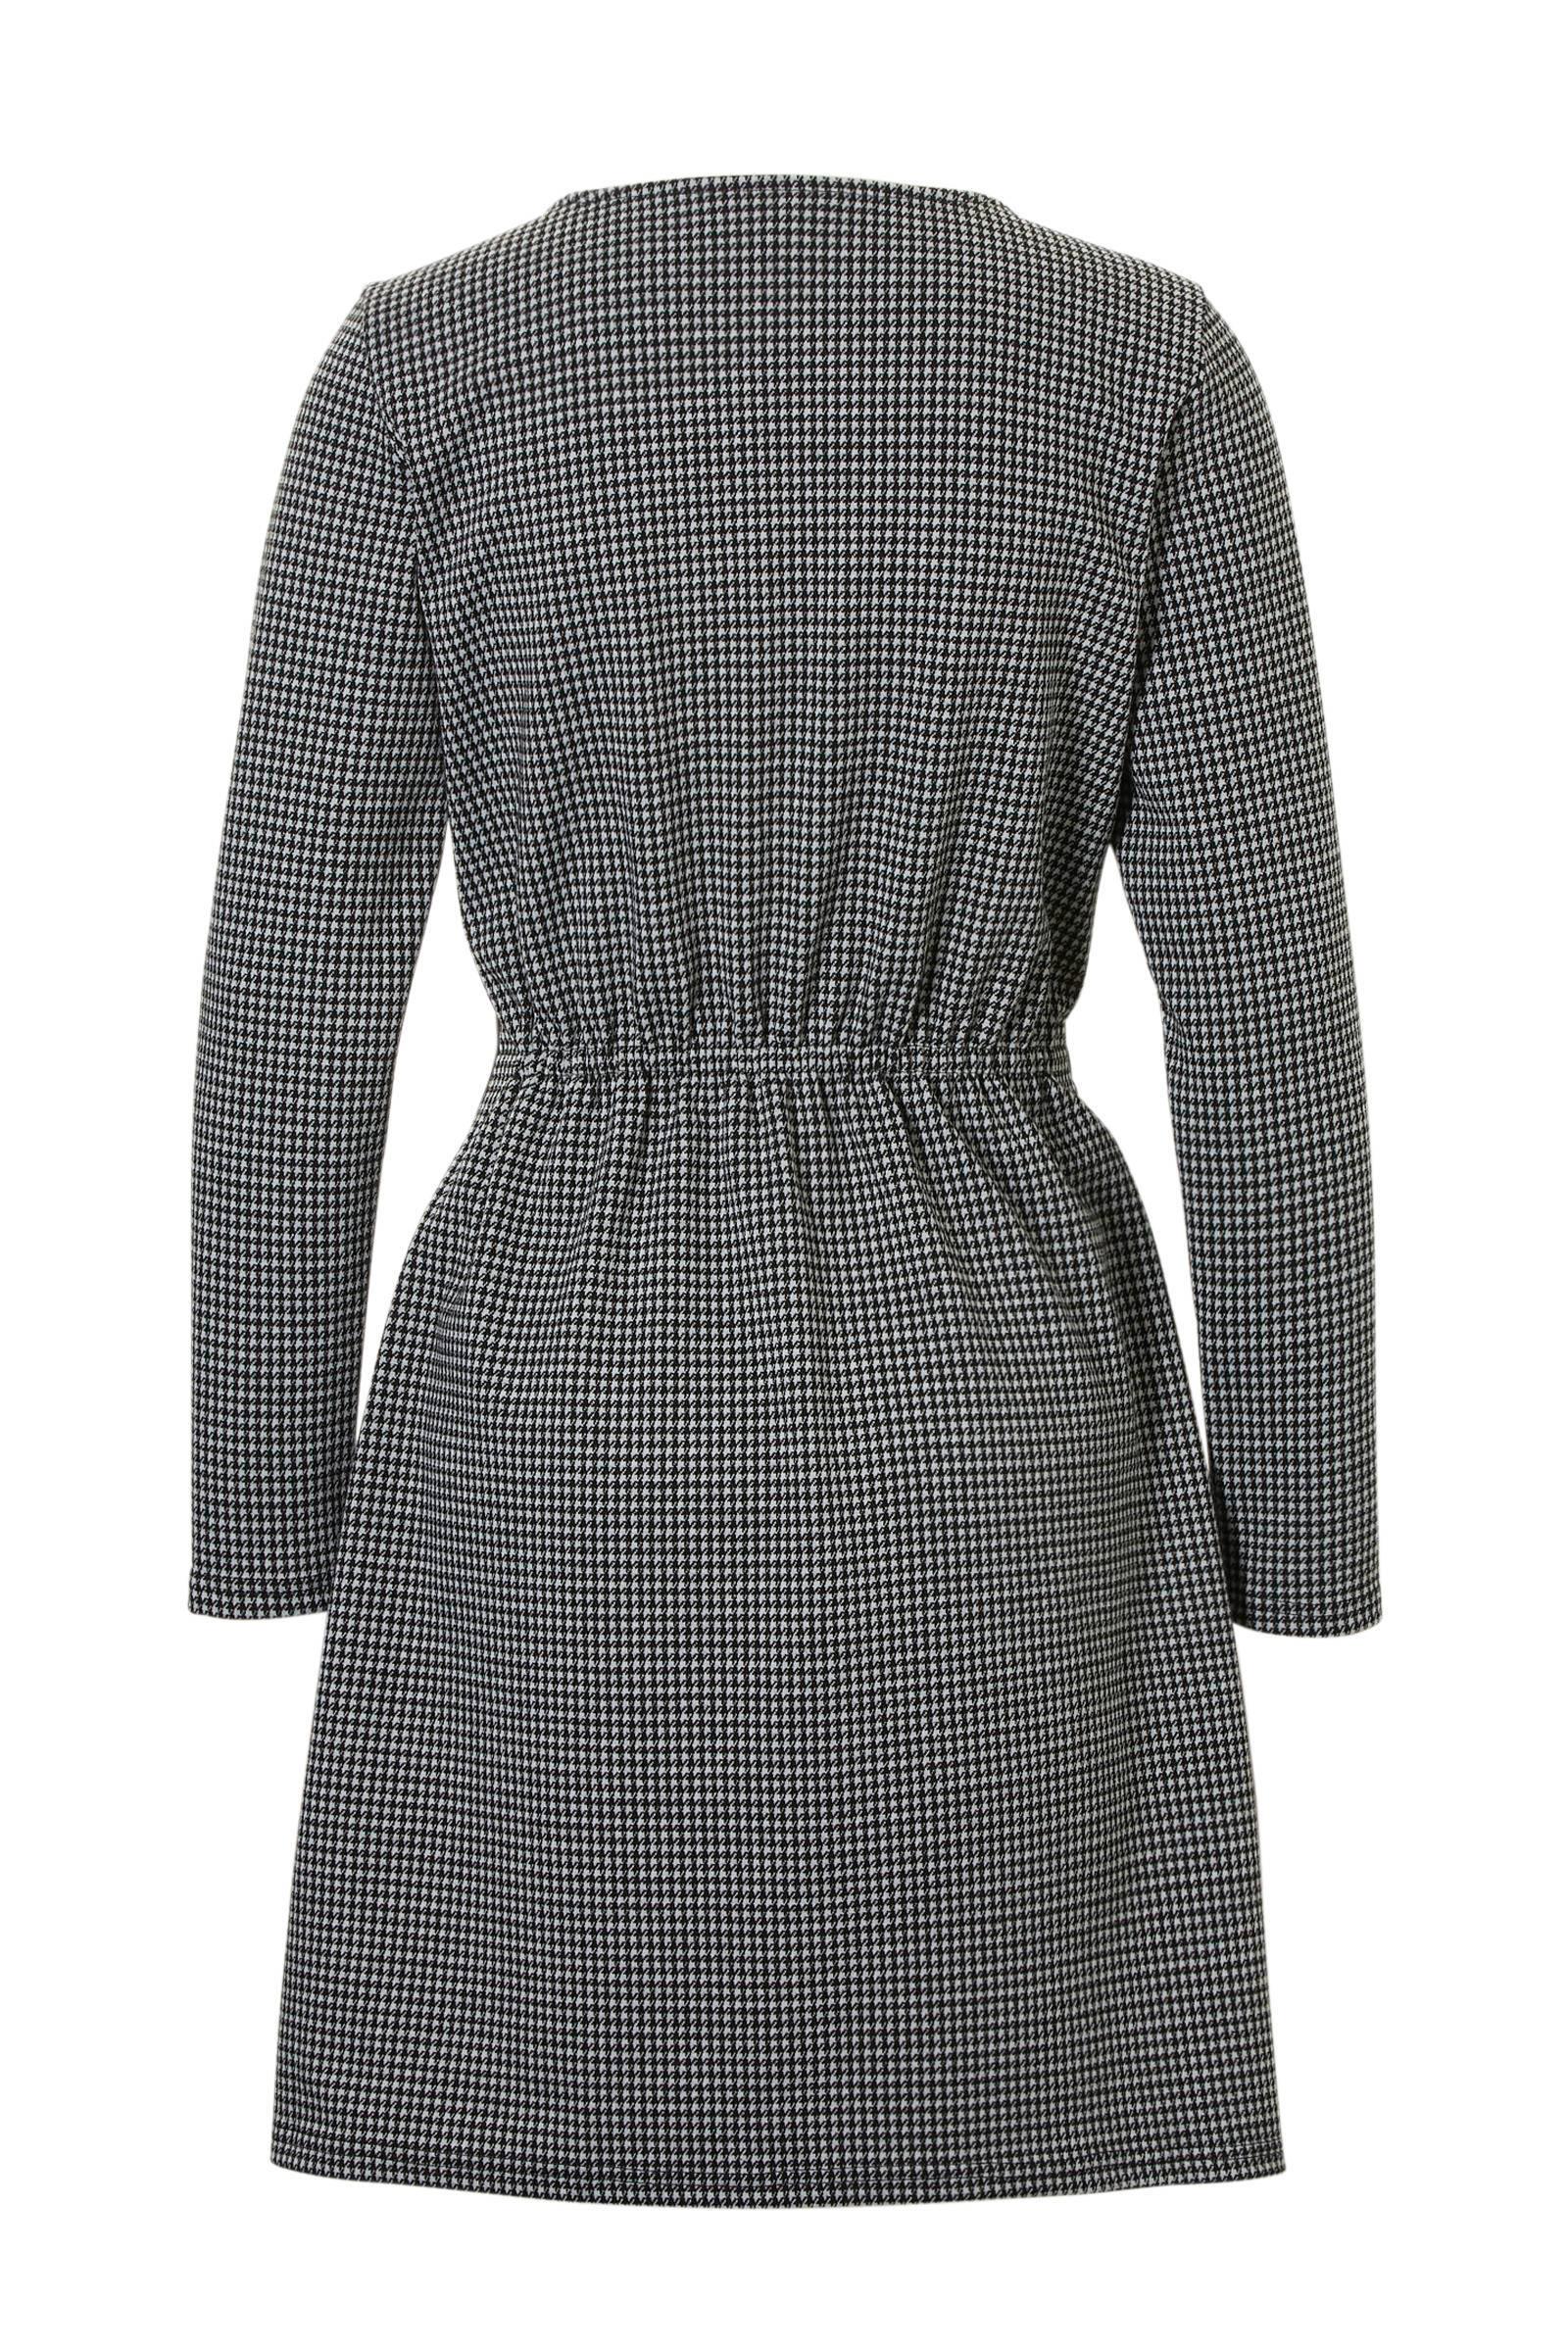 jurk Tailor jurk Tom Tailor met met ruitprint ruitprint Tom Z5w5q